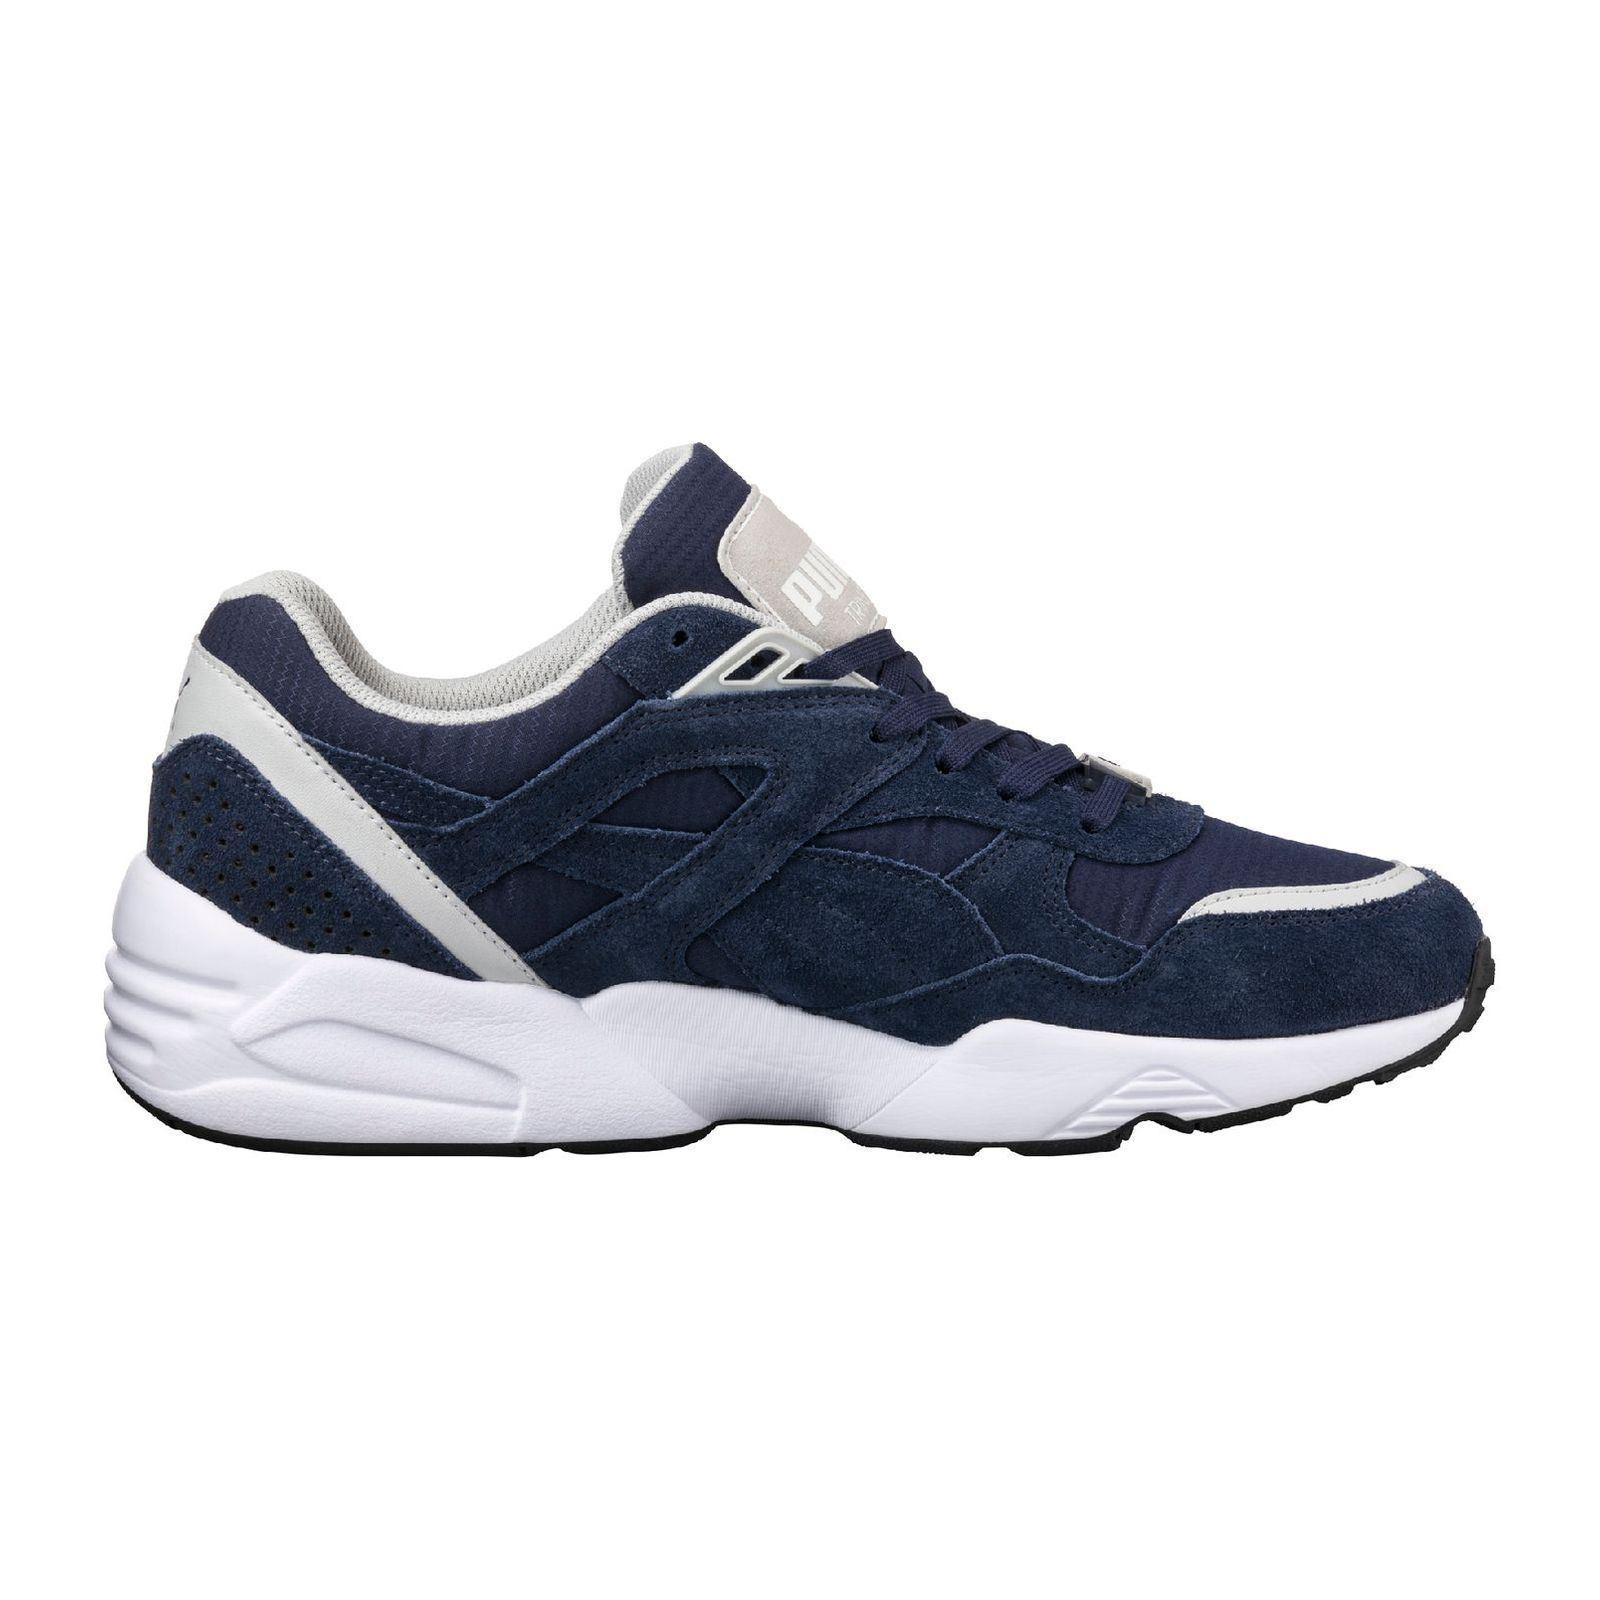 Sneakers femme bleu marine